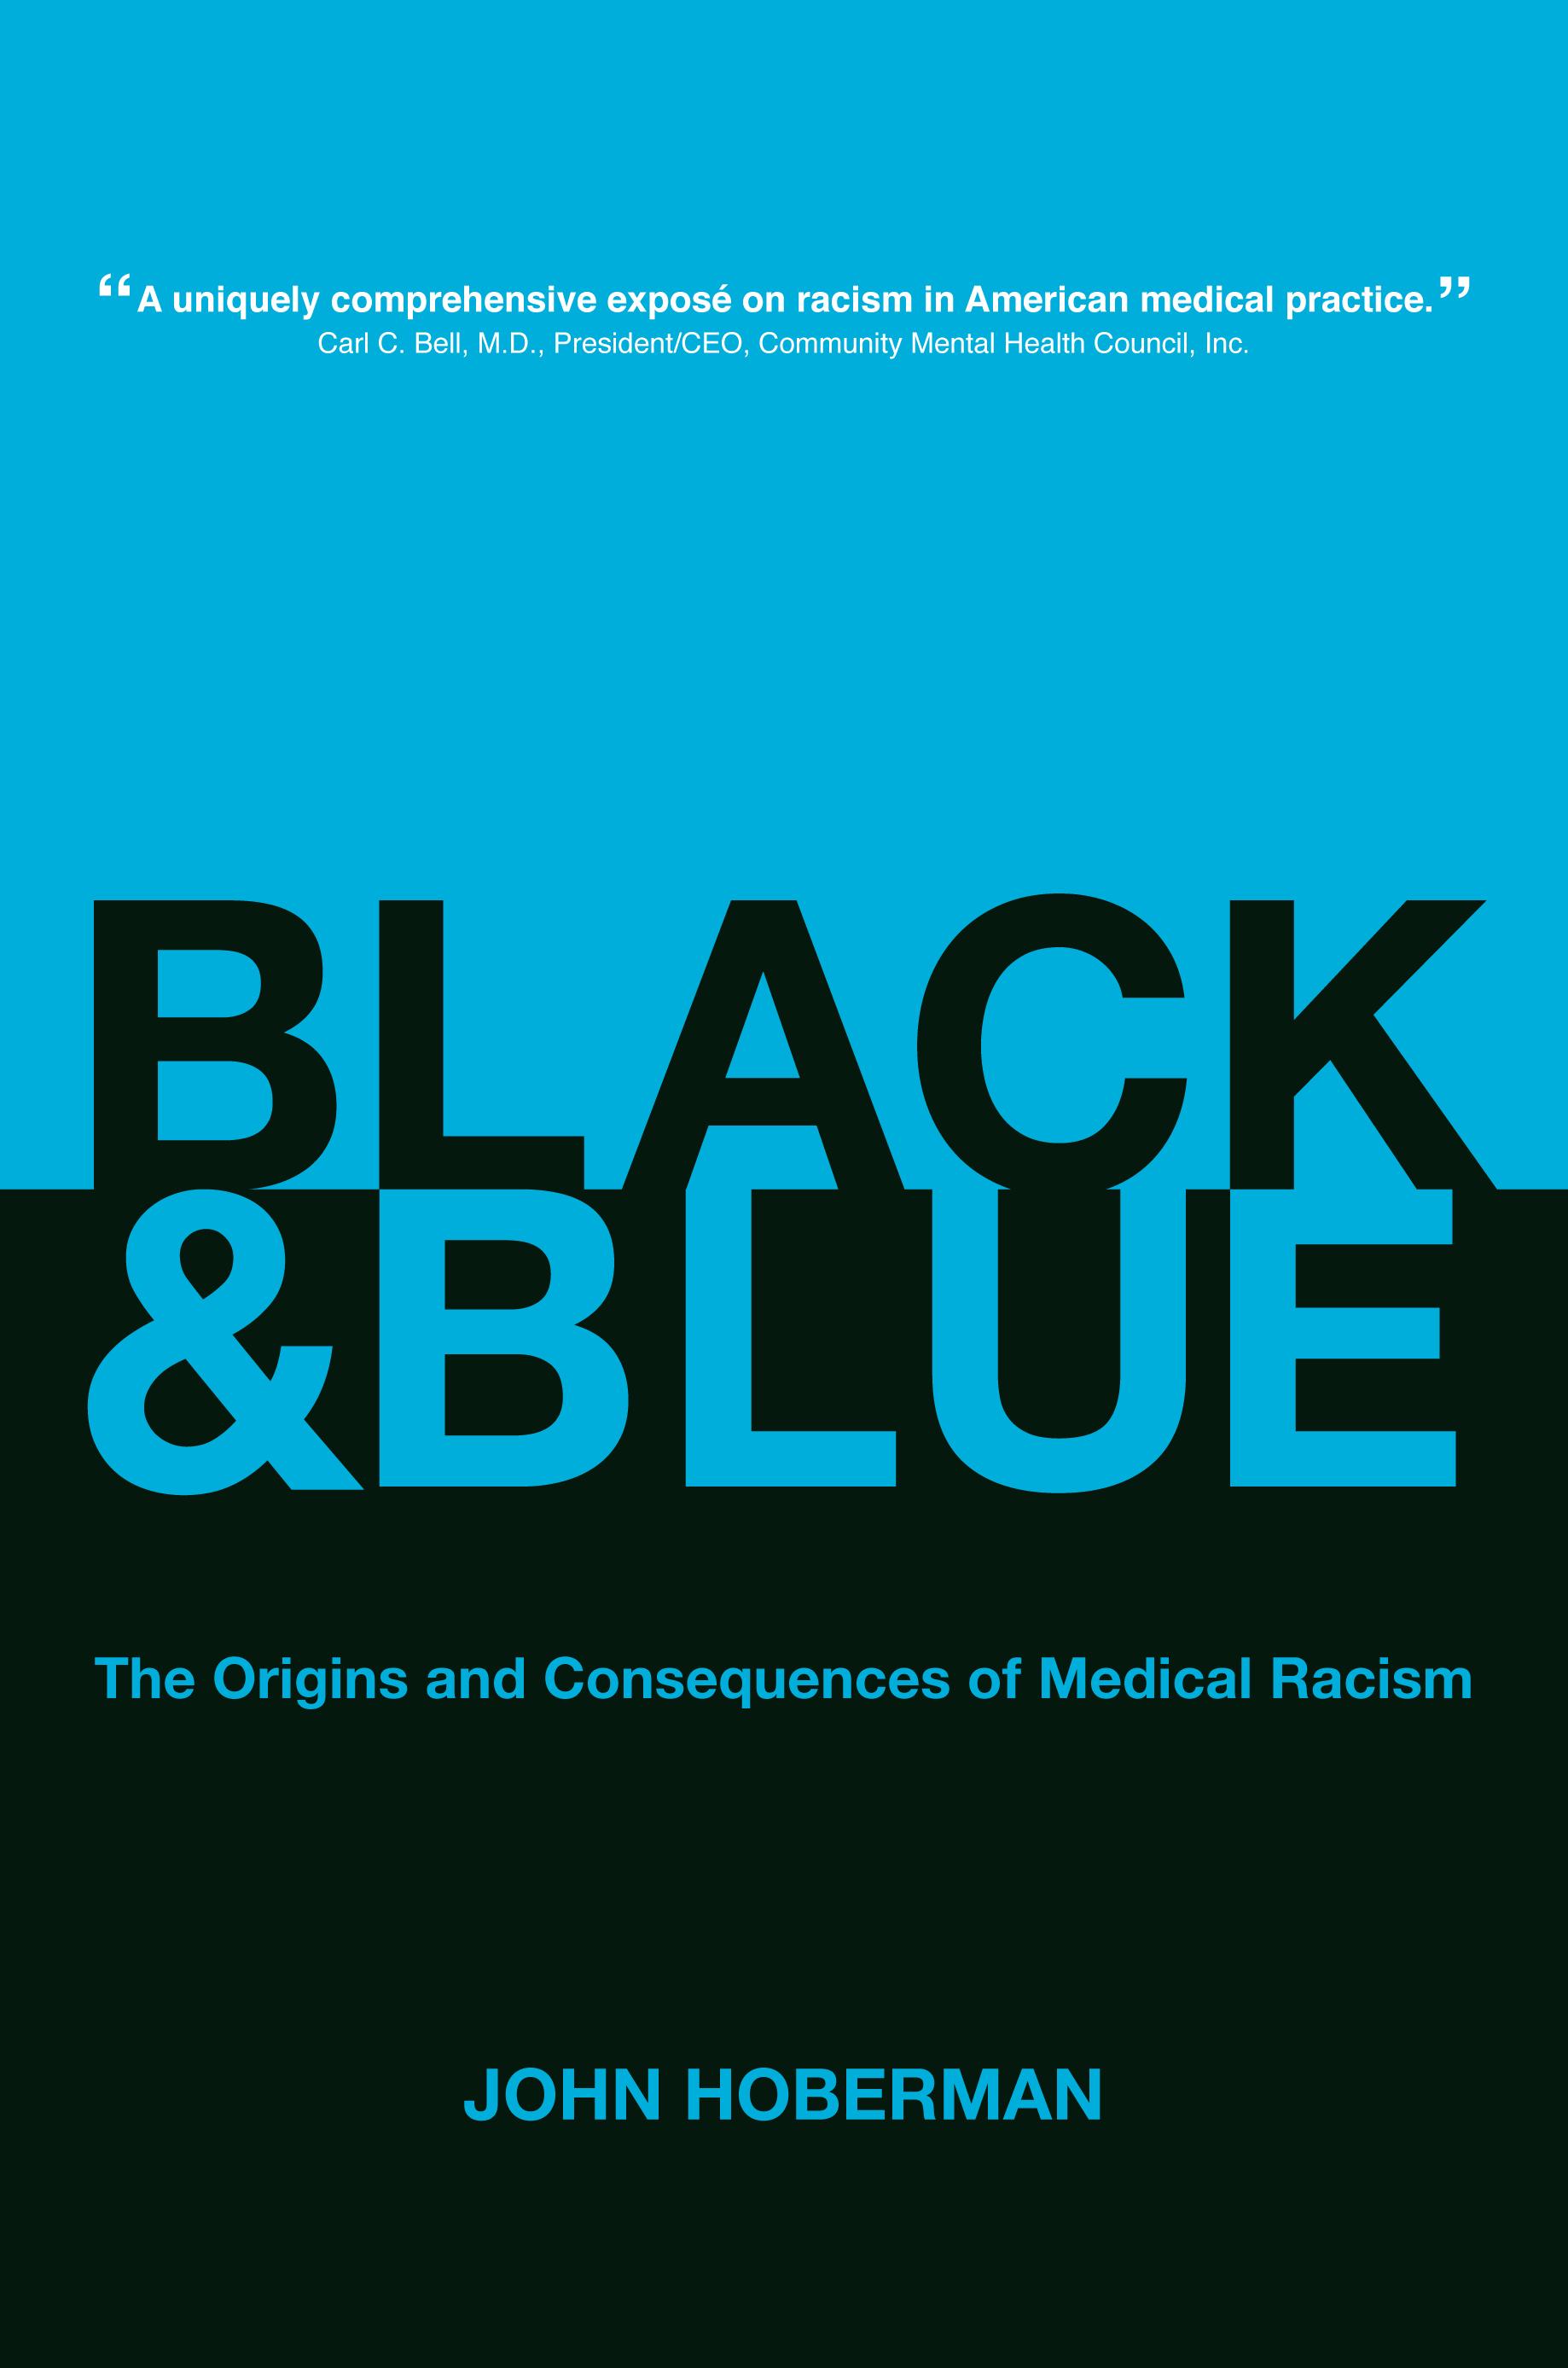 Black and Blue by John Hoberman - Paperback - University of